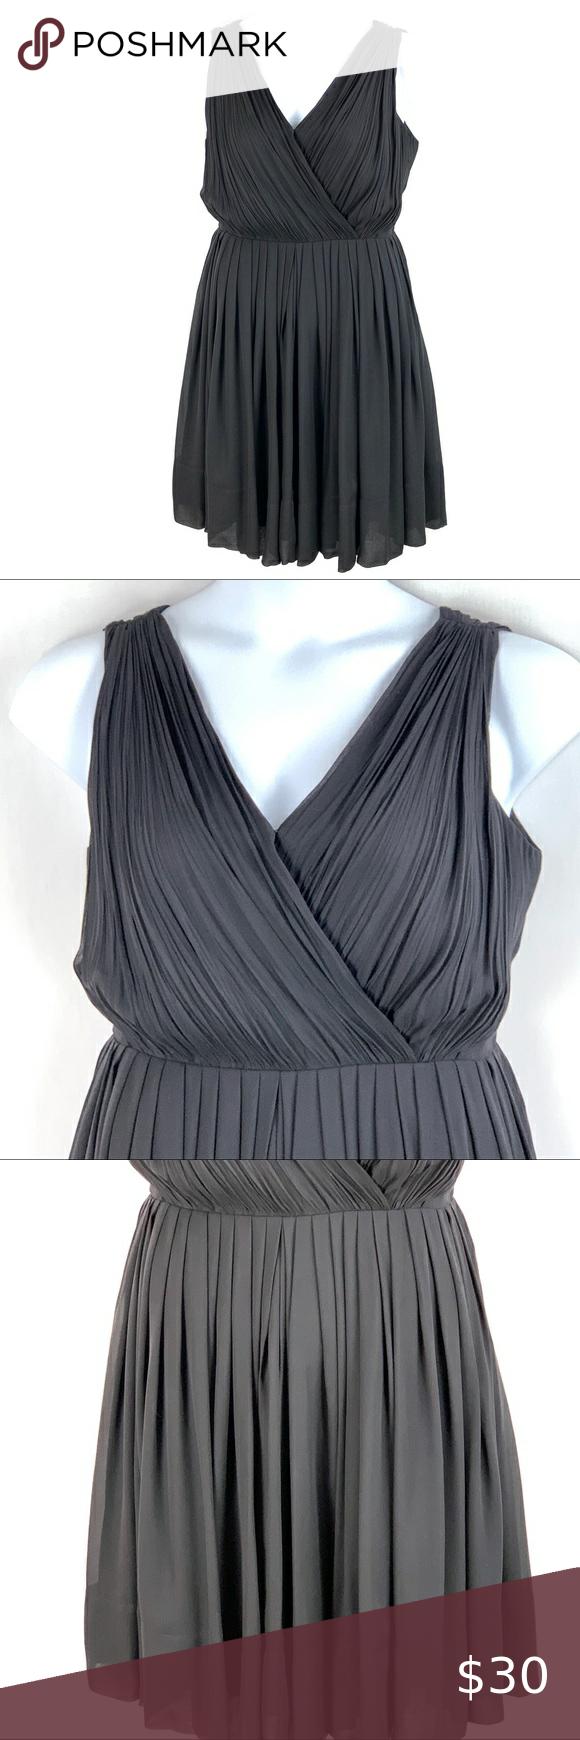 Talbots Black Silk Sleeveless Dress Size 8 Womens Sleeveless Dress Sleeveless Dress Black Silk [ 1740 x 580 Pixel ]